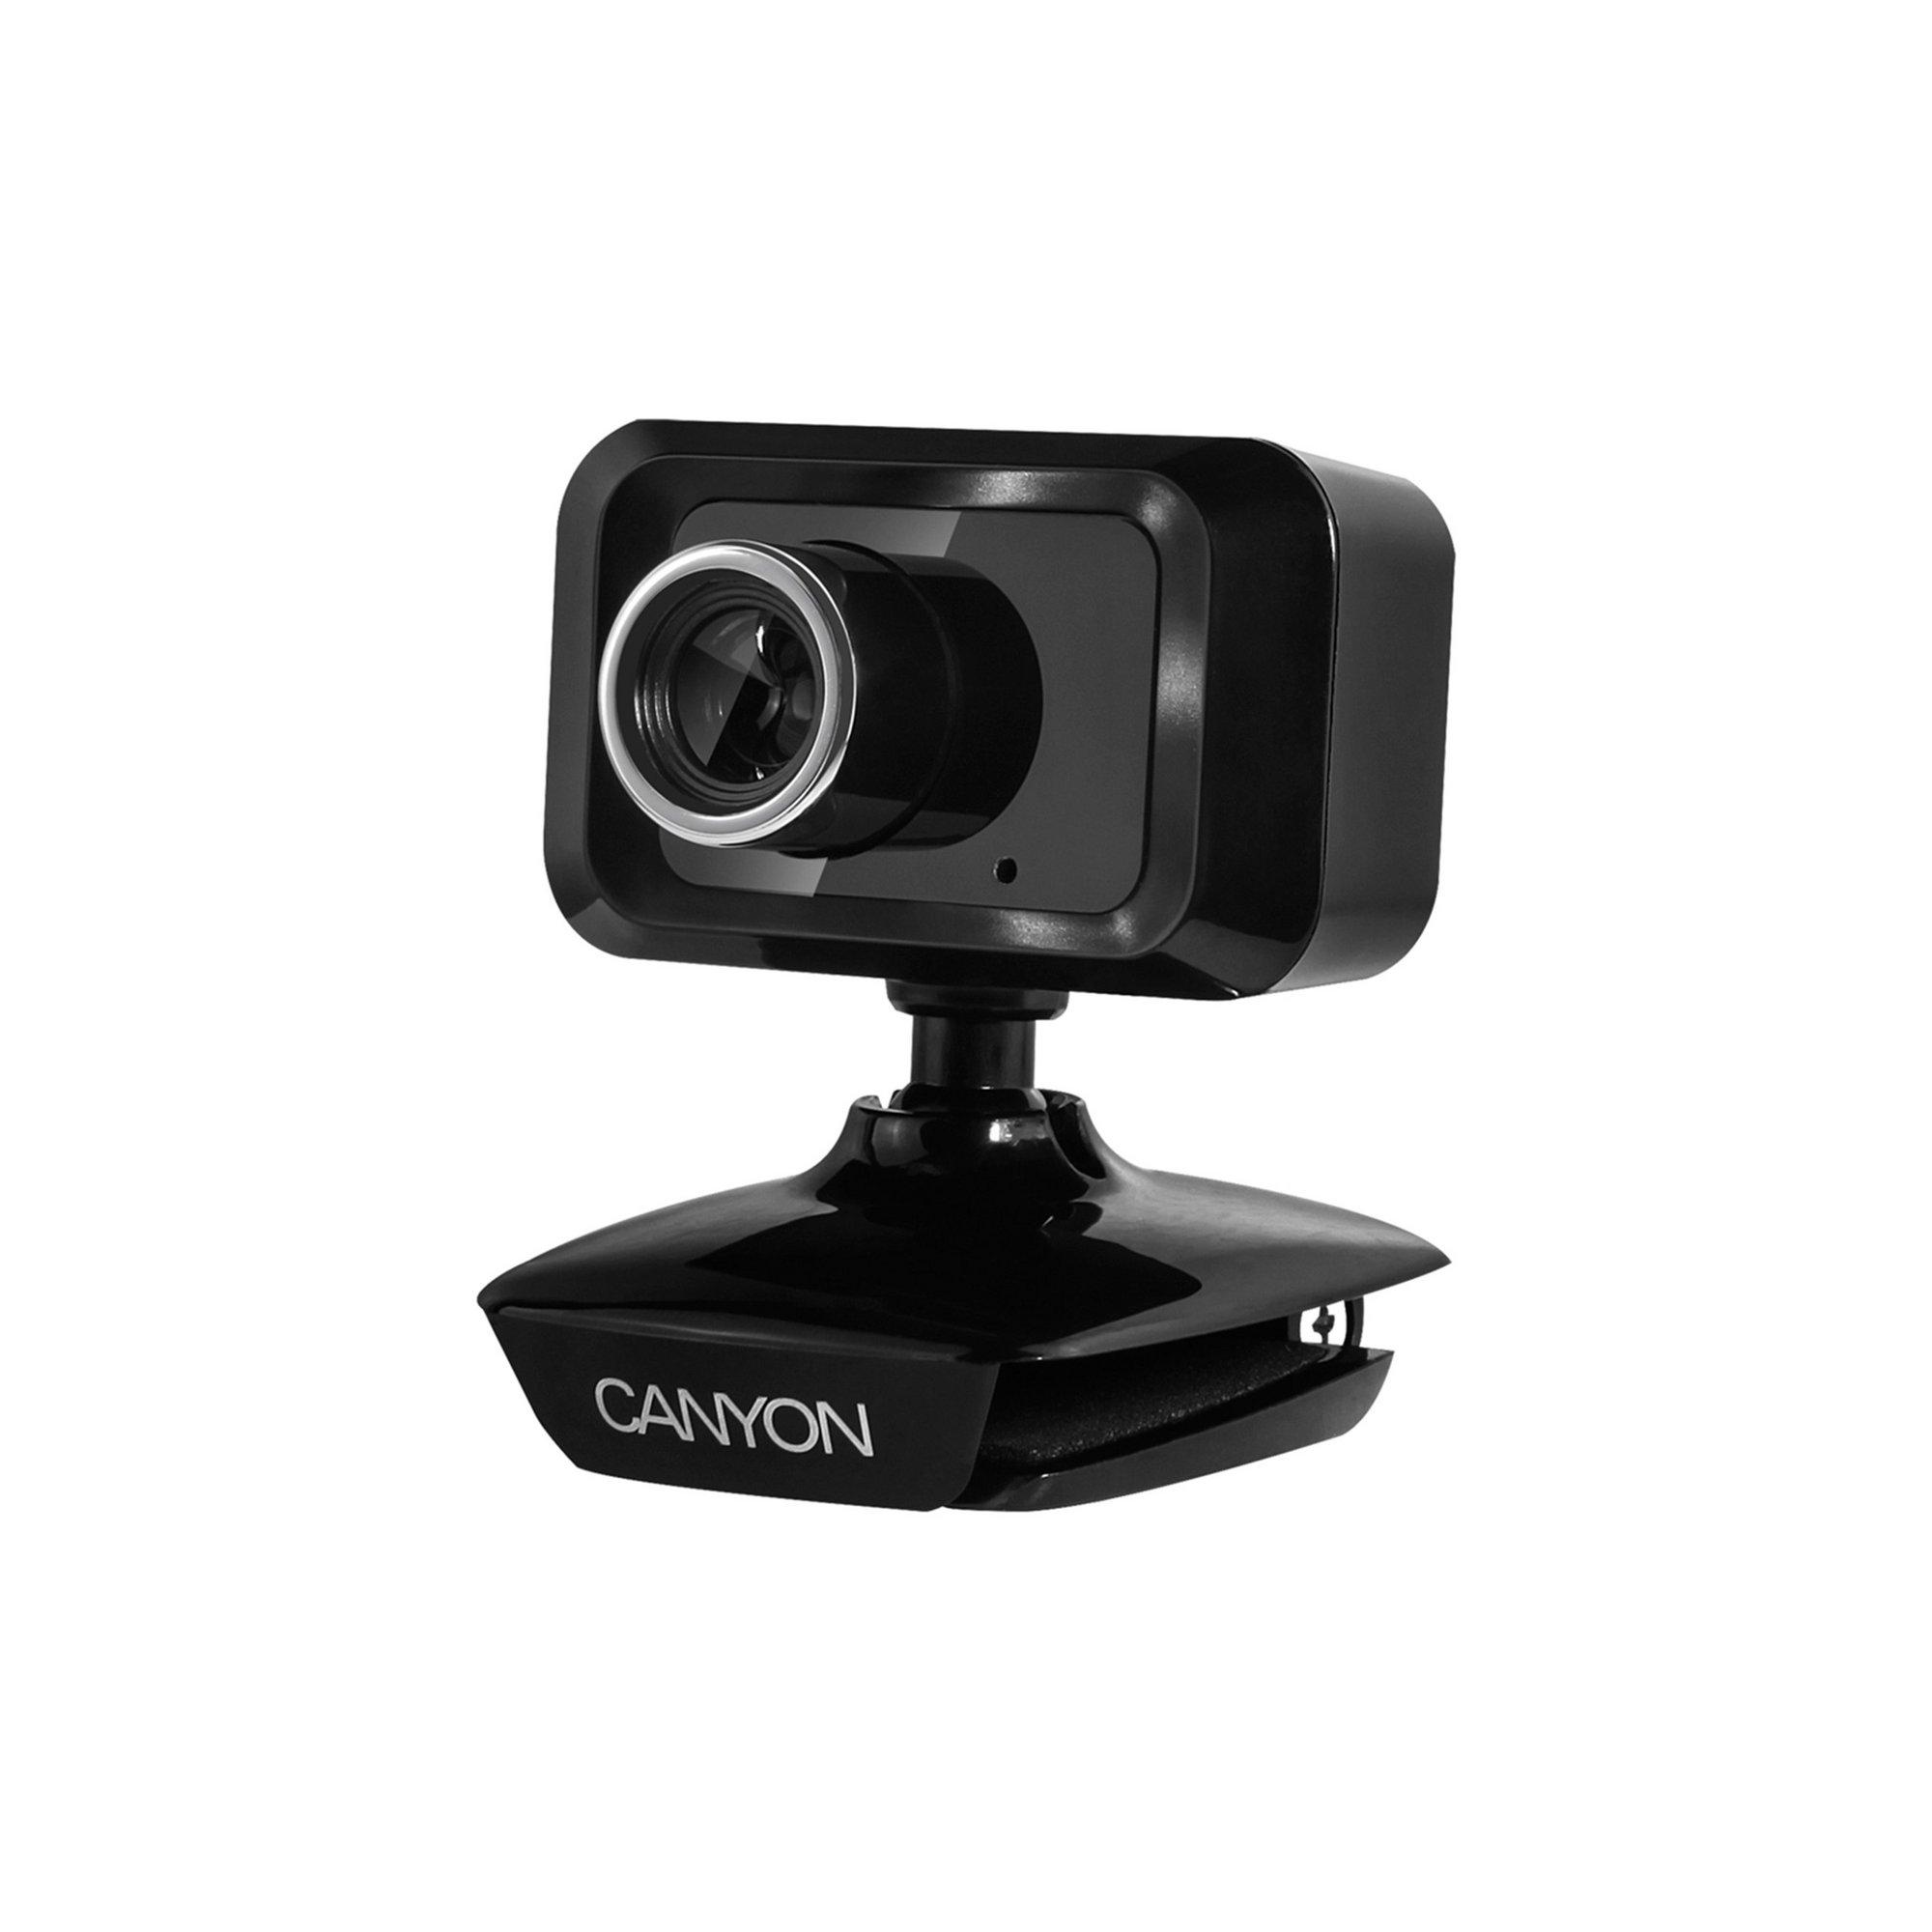 Image of Canyon 1.3MP USB Webcam